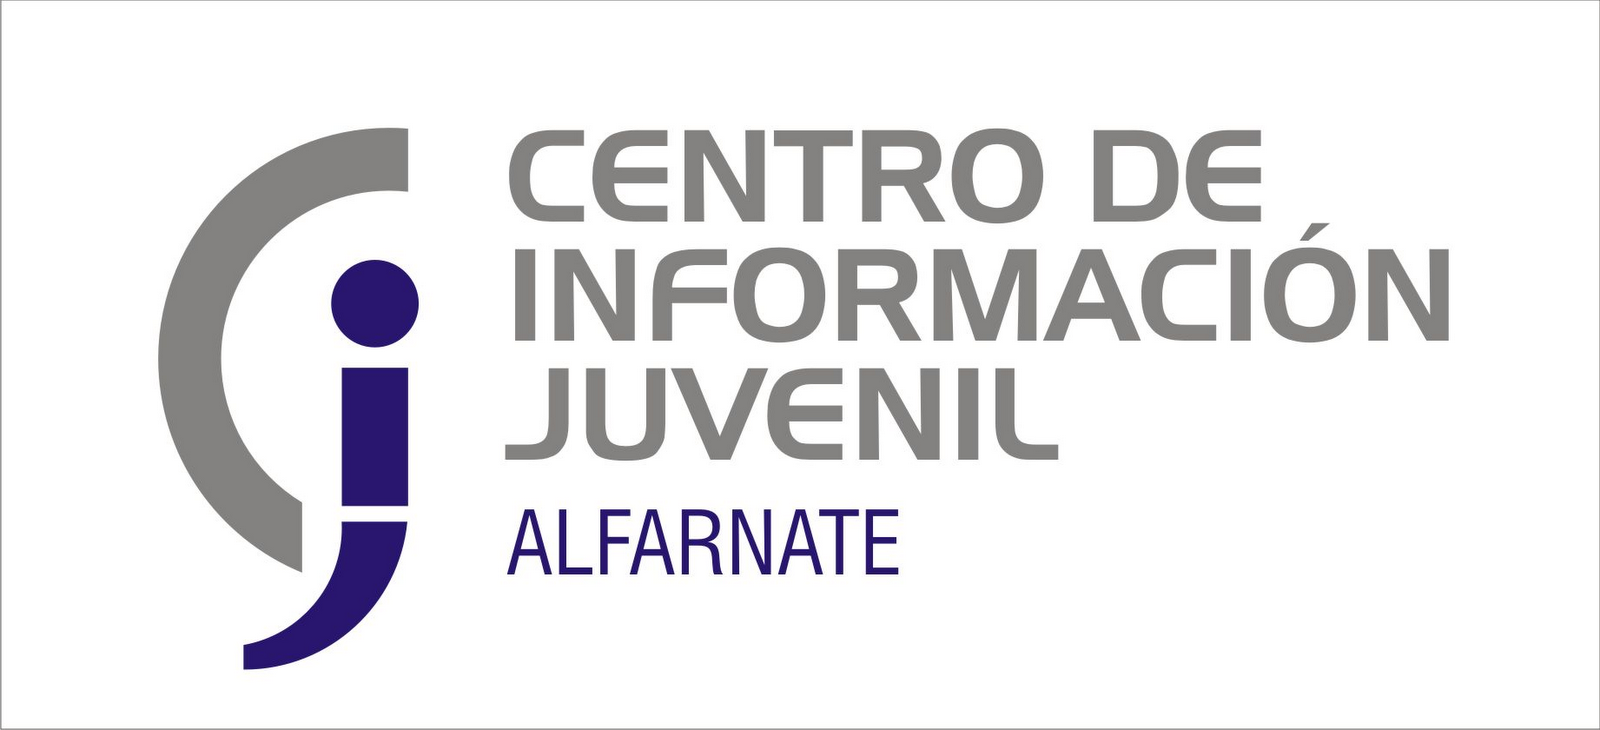 JUVENTUD DE ALFARNATE